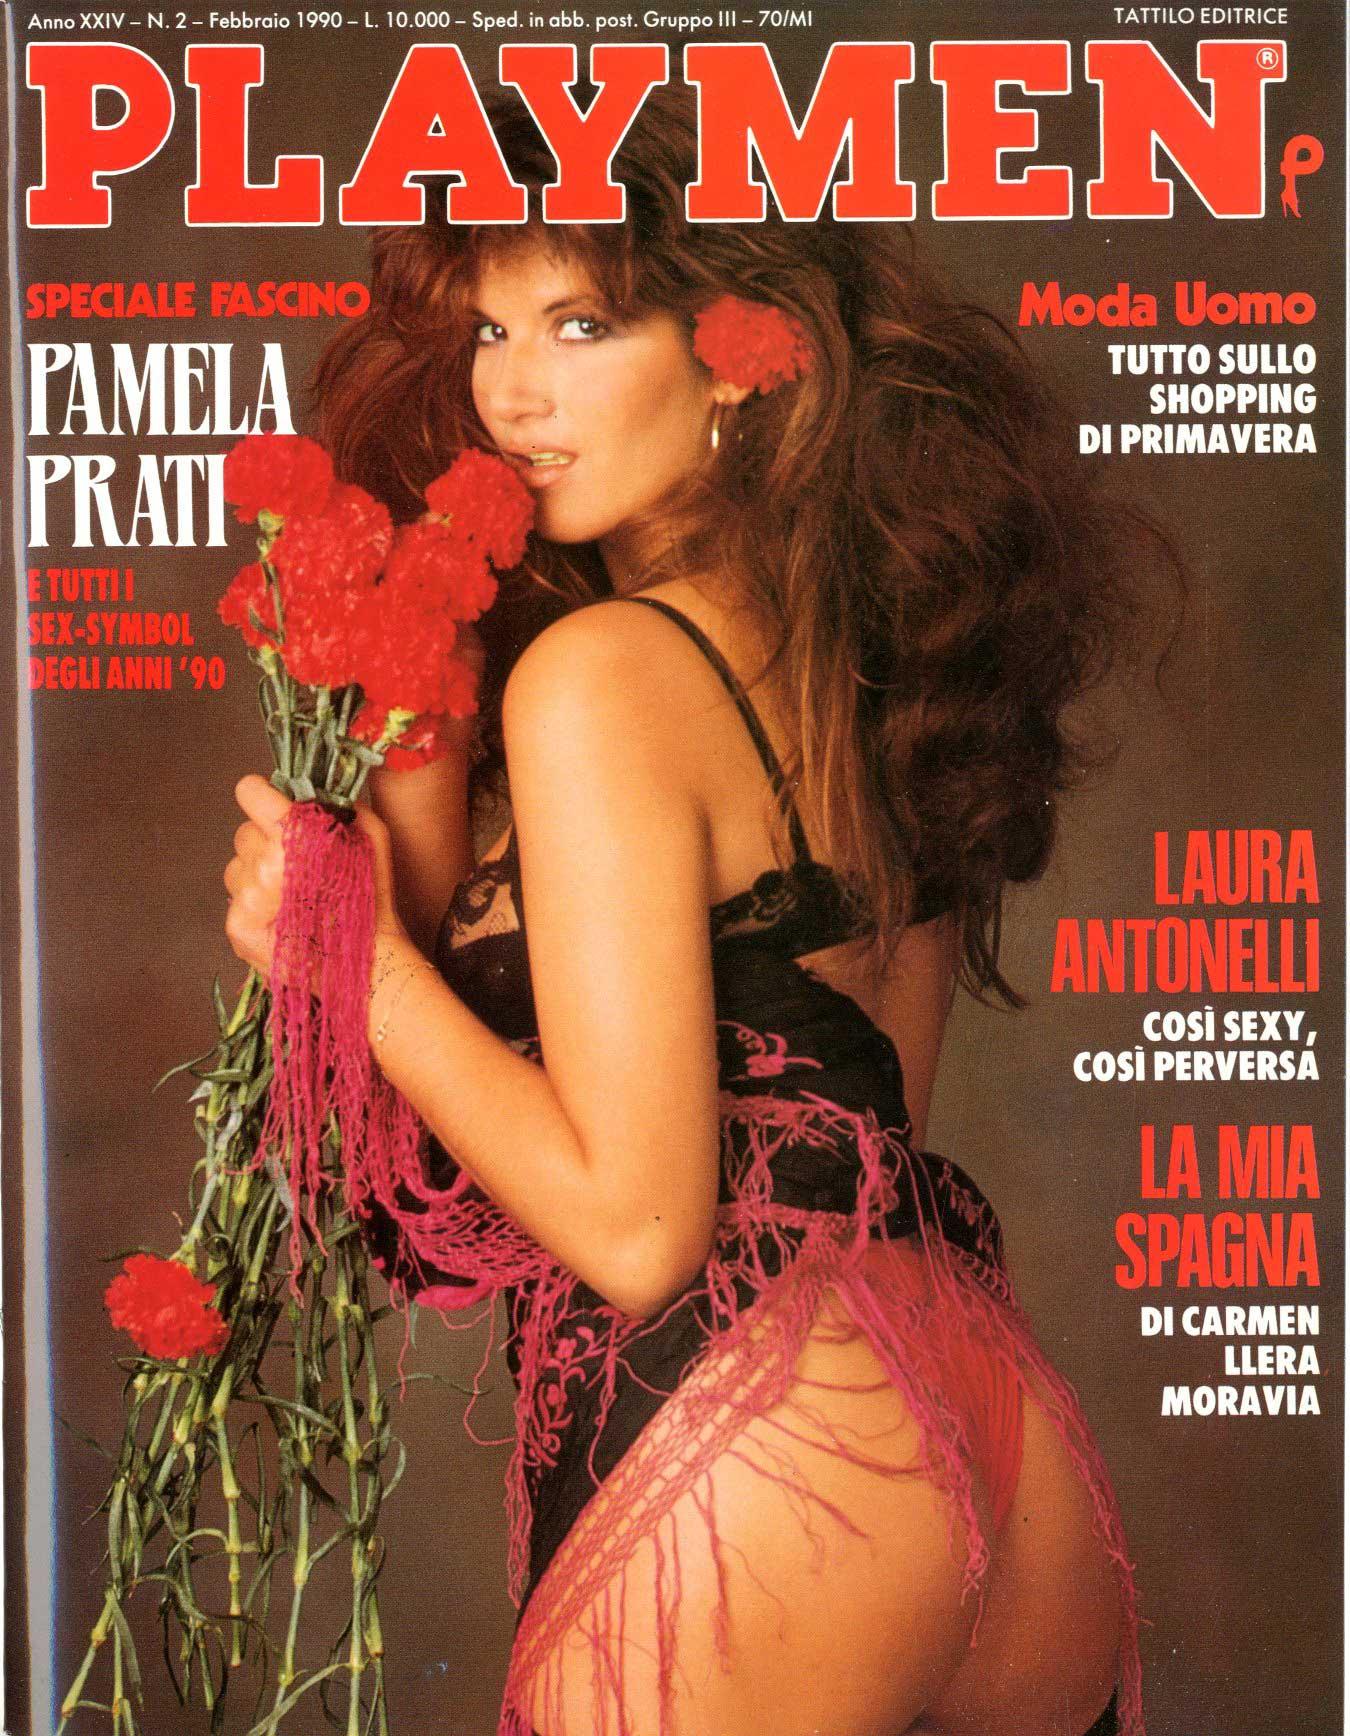 Calendario Pamela Prati.Tattilo Editrice Playmen 1990 Anno 24 2 Pamela Prati